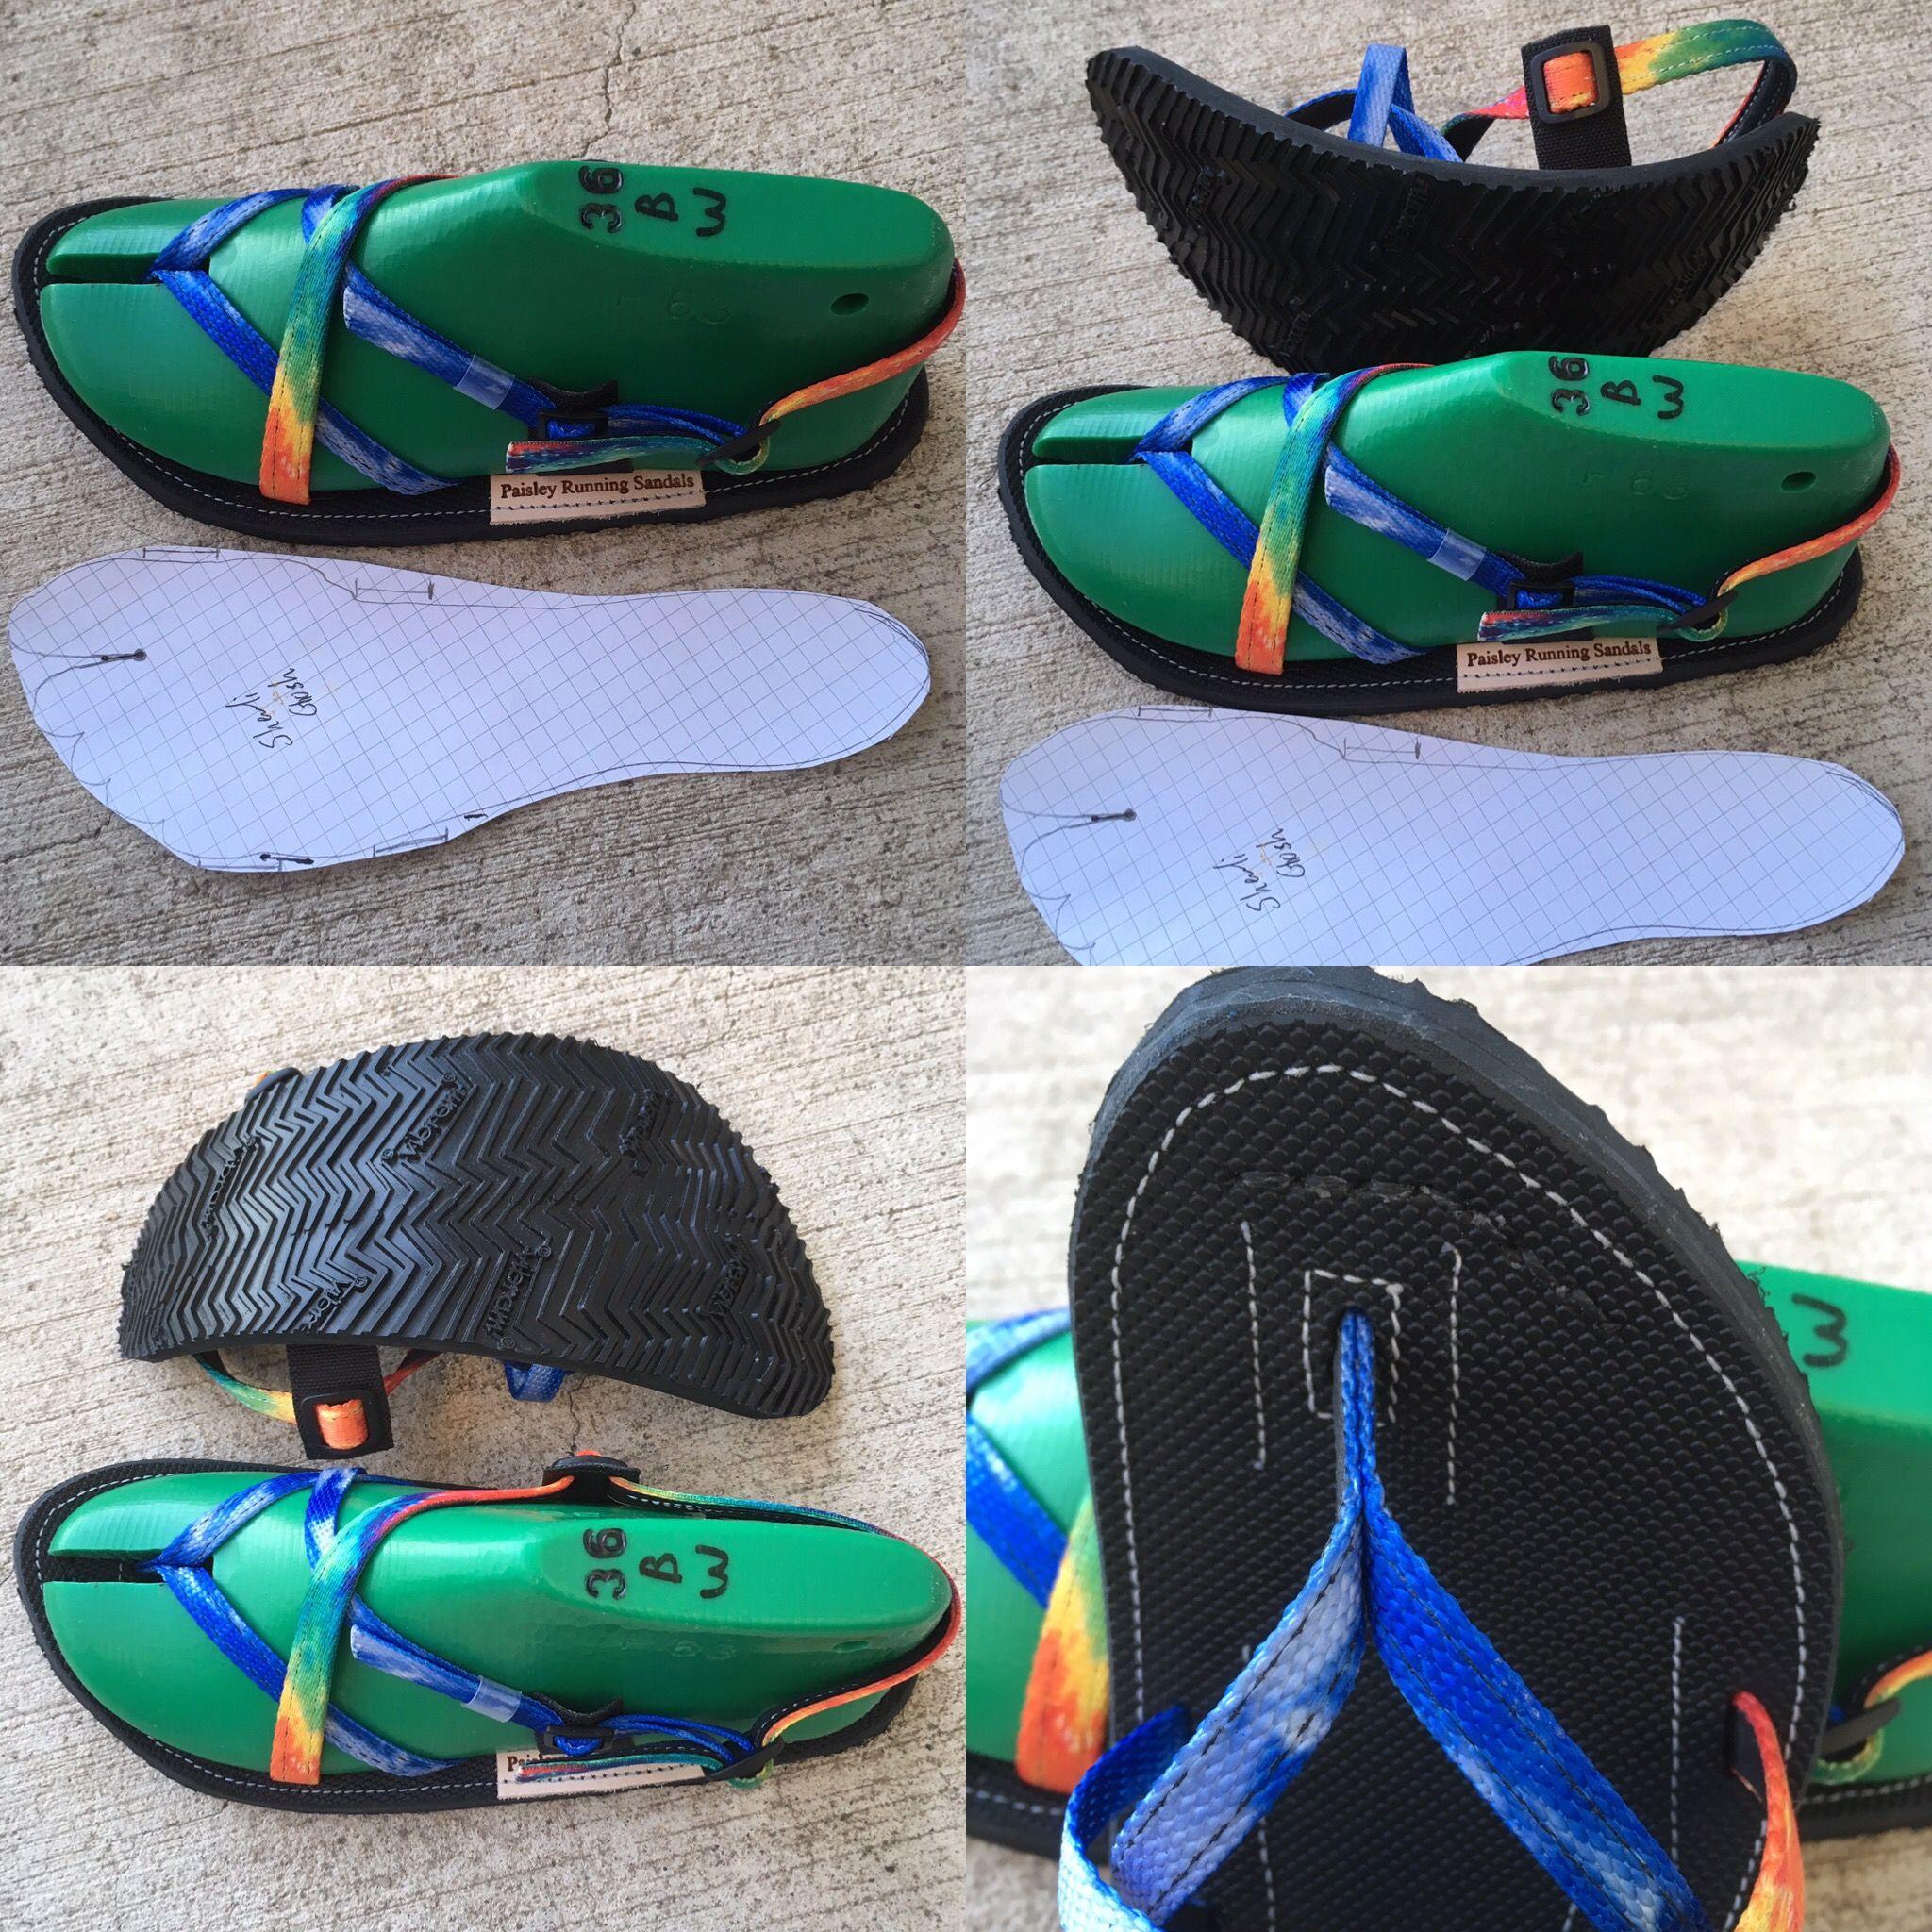 Custom made sandals  Handmade in Colorado  Shown in blue